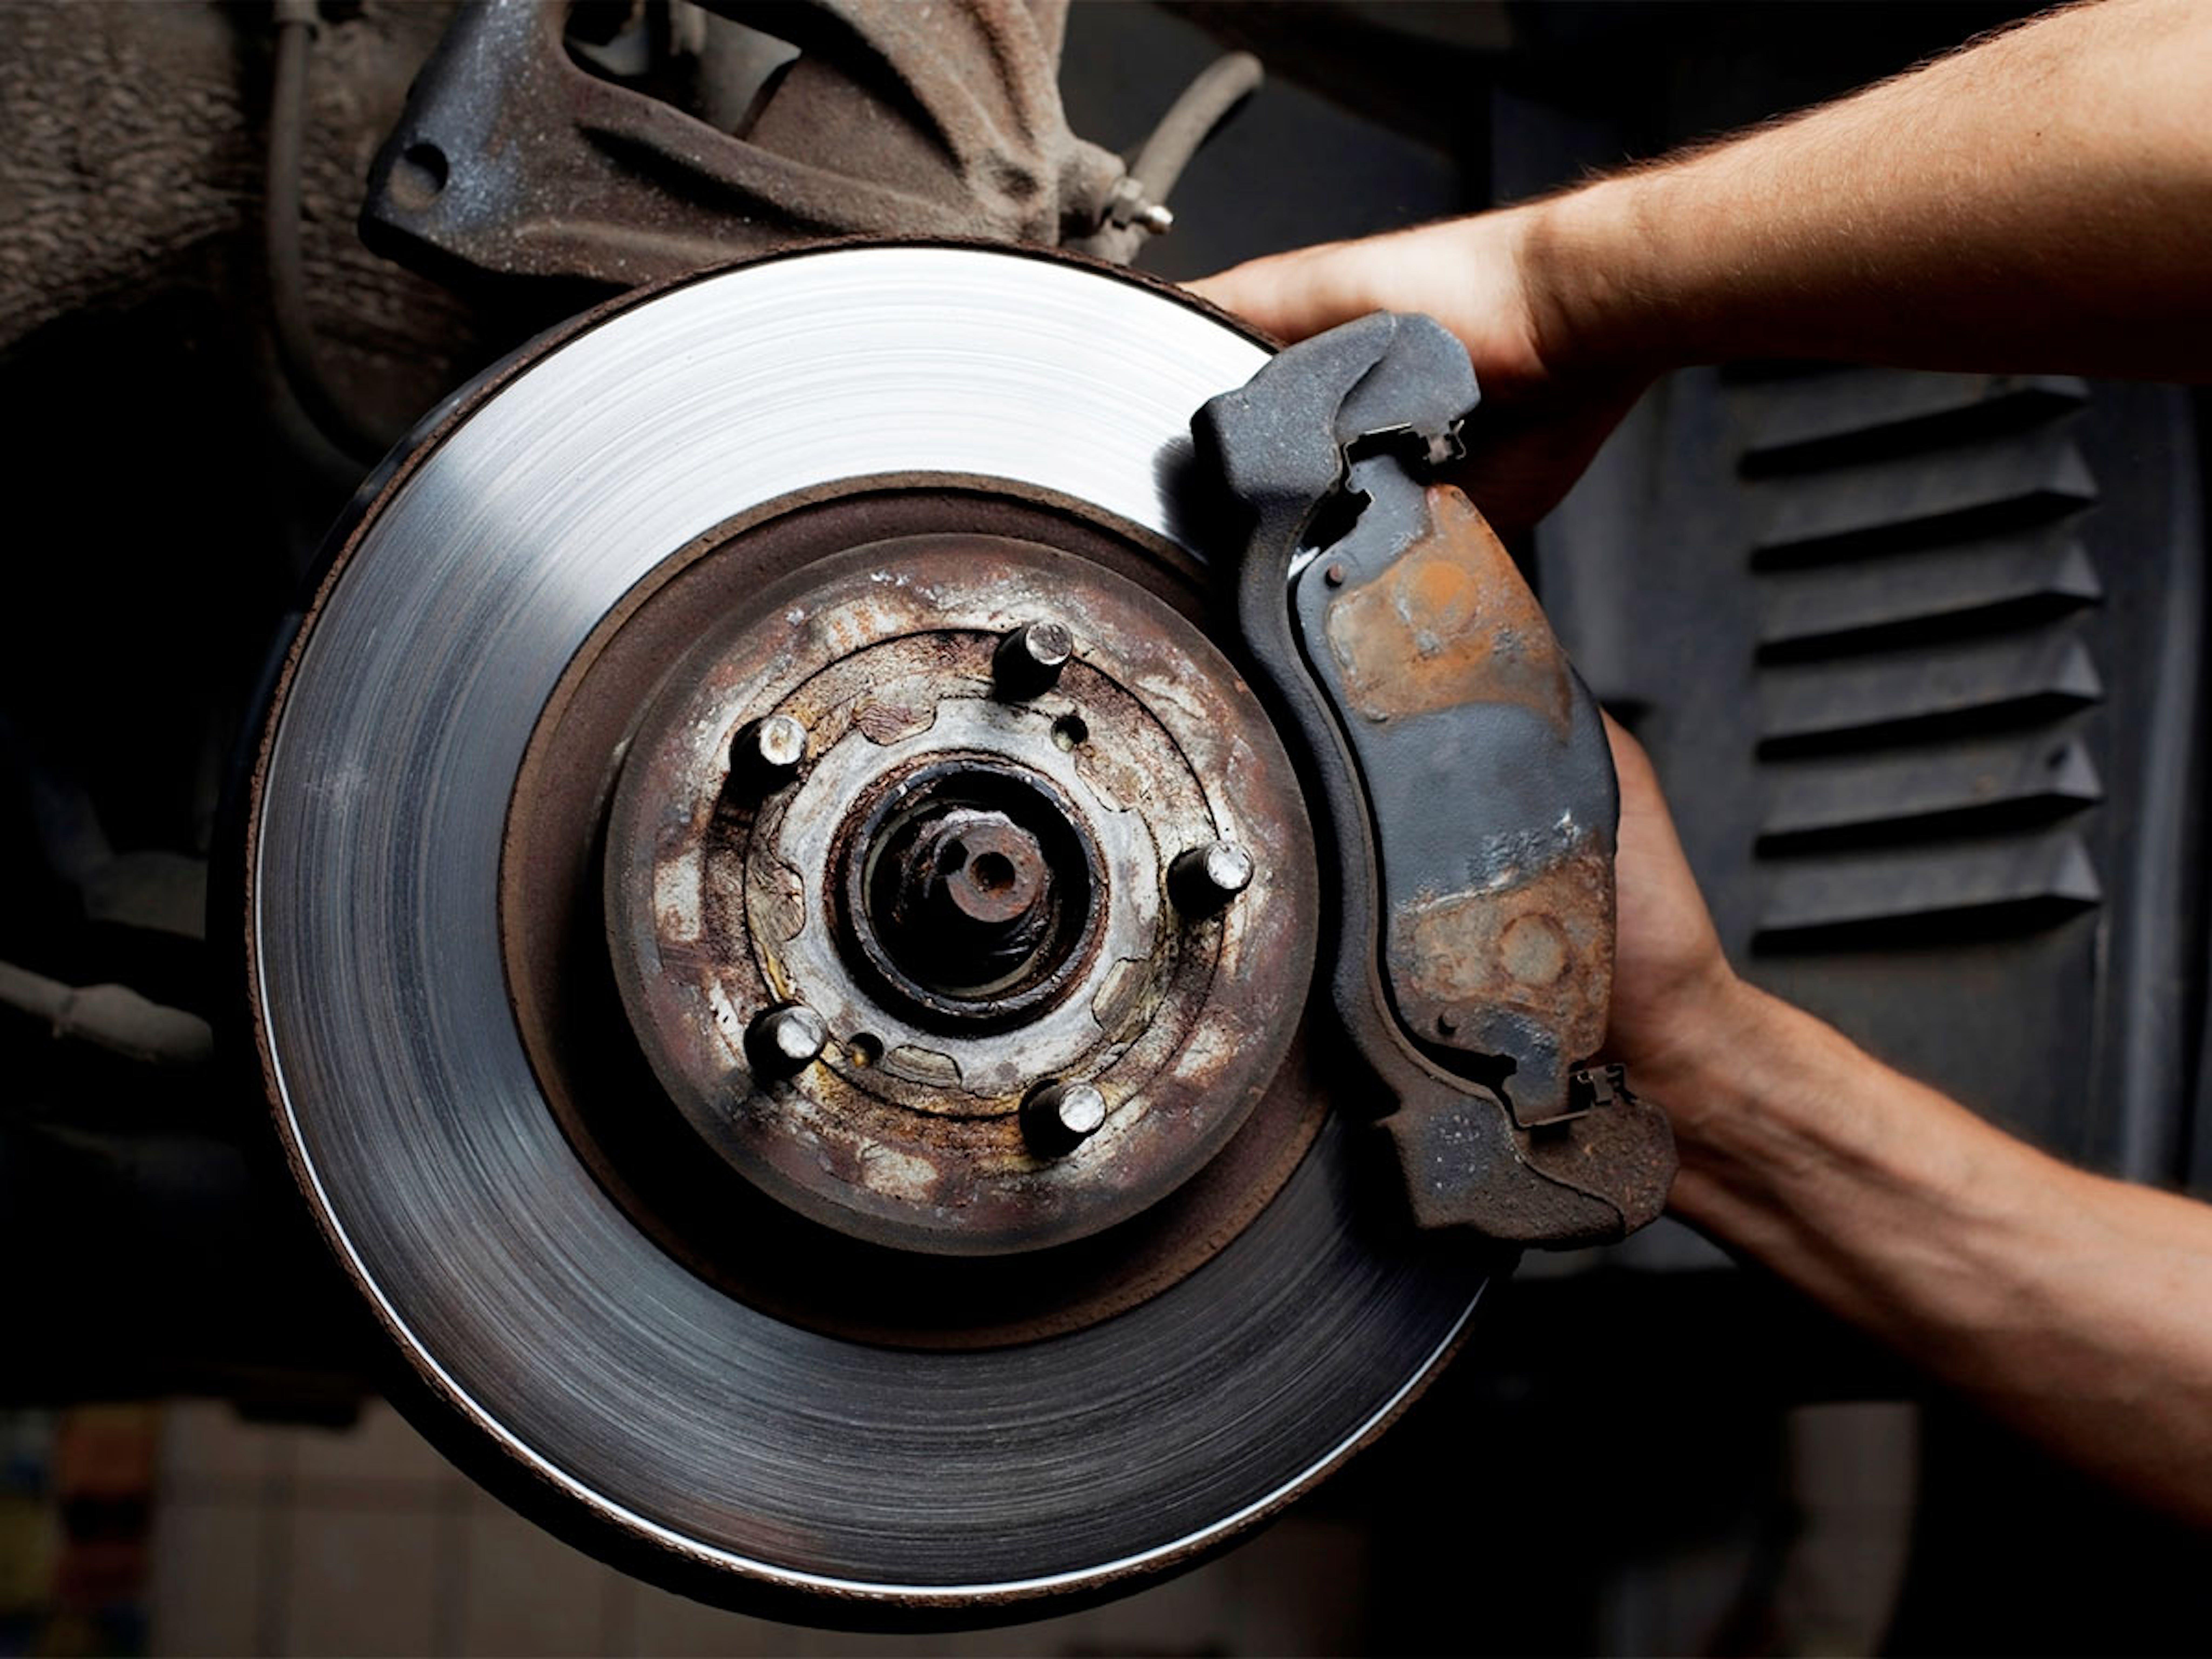 brake checks, repairs, and services